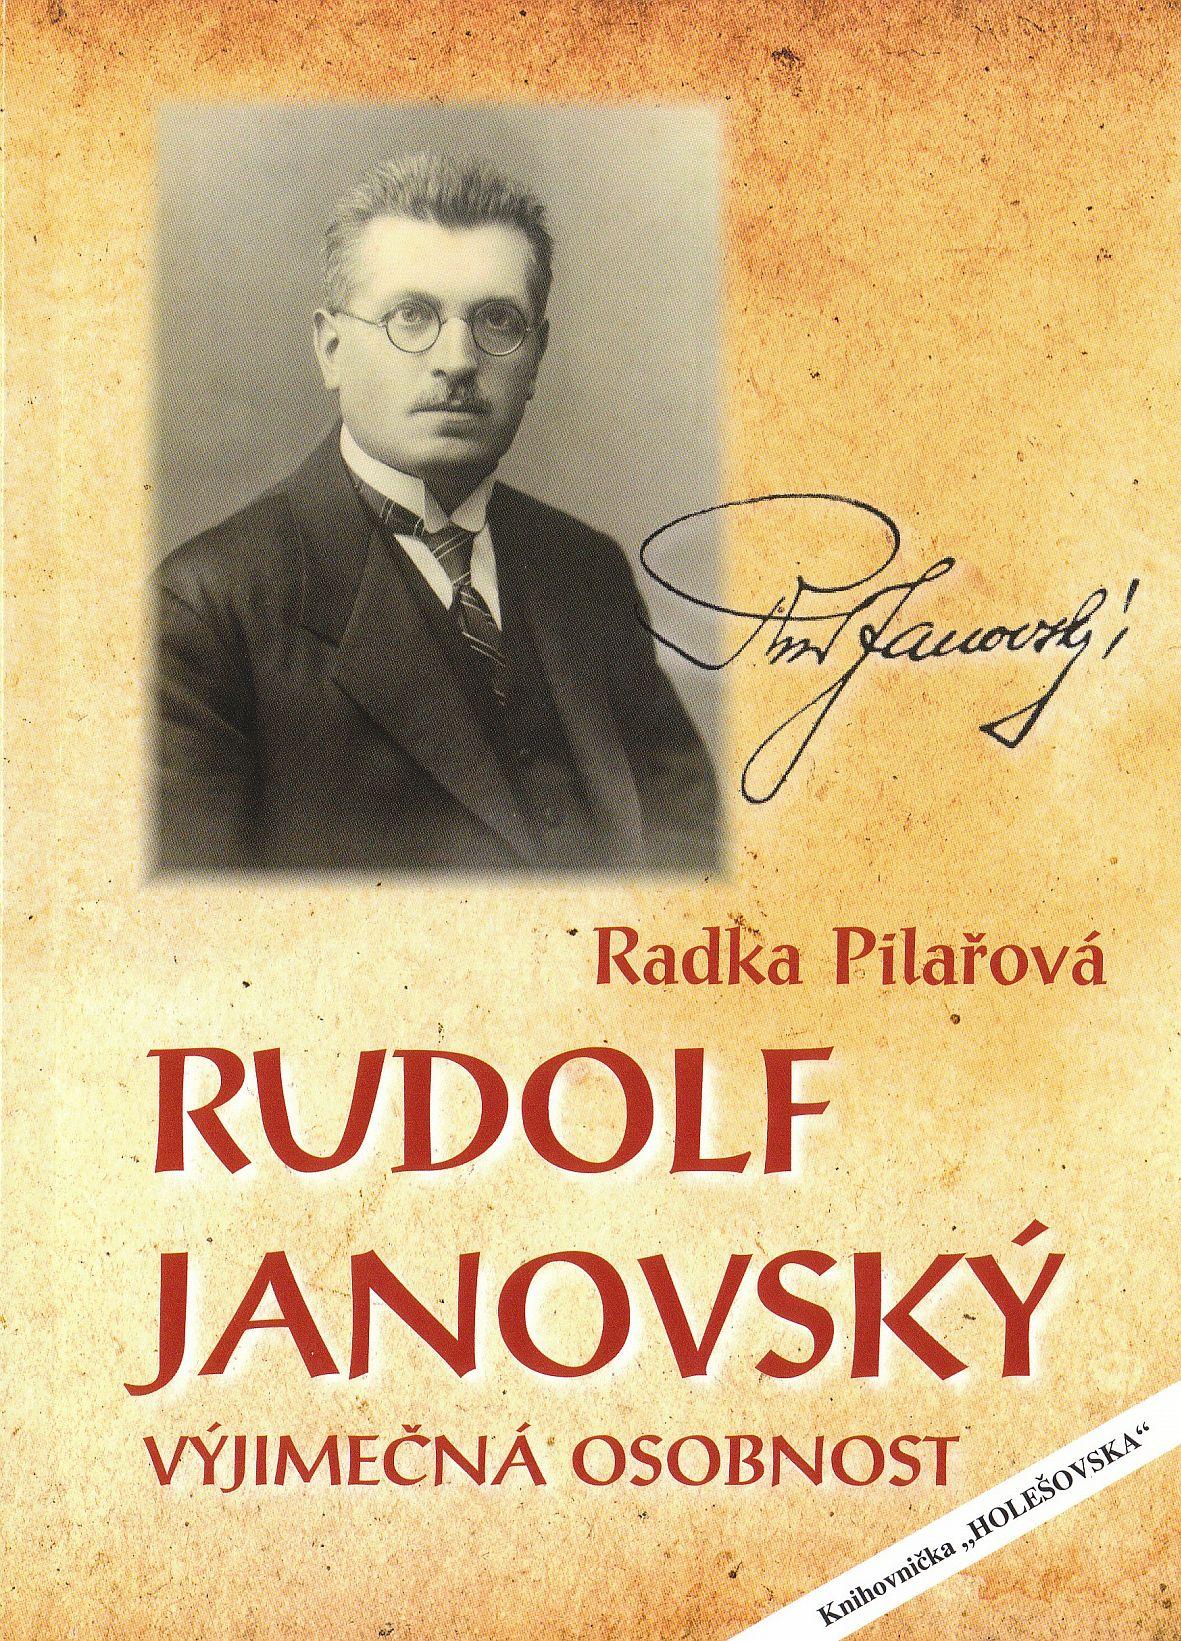 OBRÁZEK : obalka_nove_knihy_o_zivote_rudolfa_janovskeho_vydane_v_zari_2013.jpg